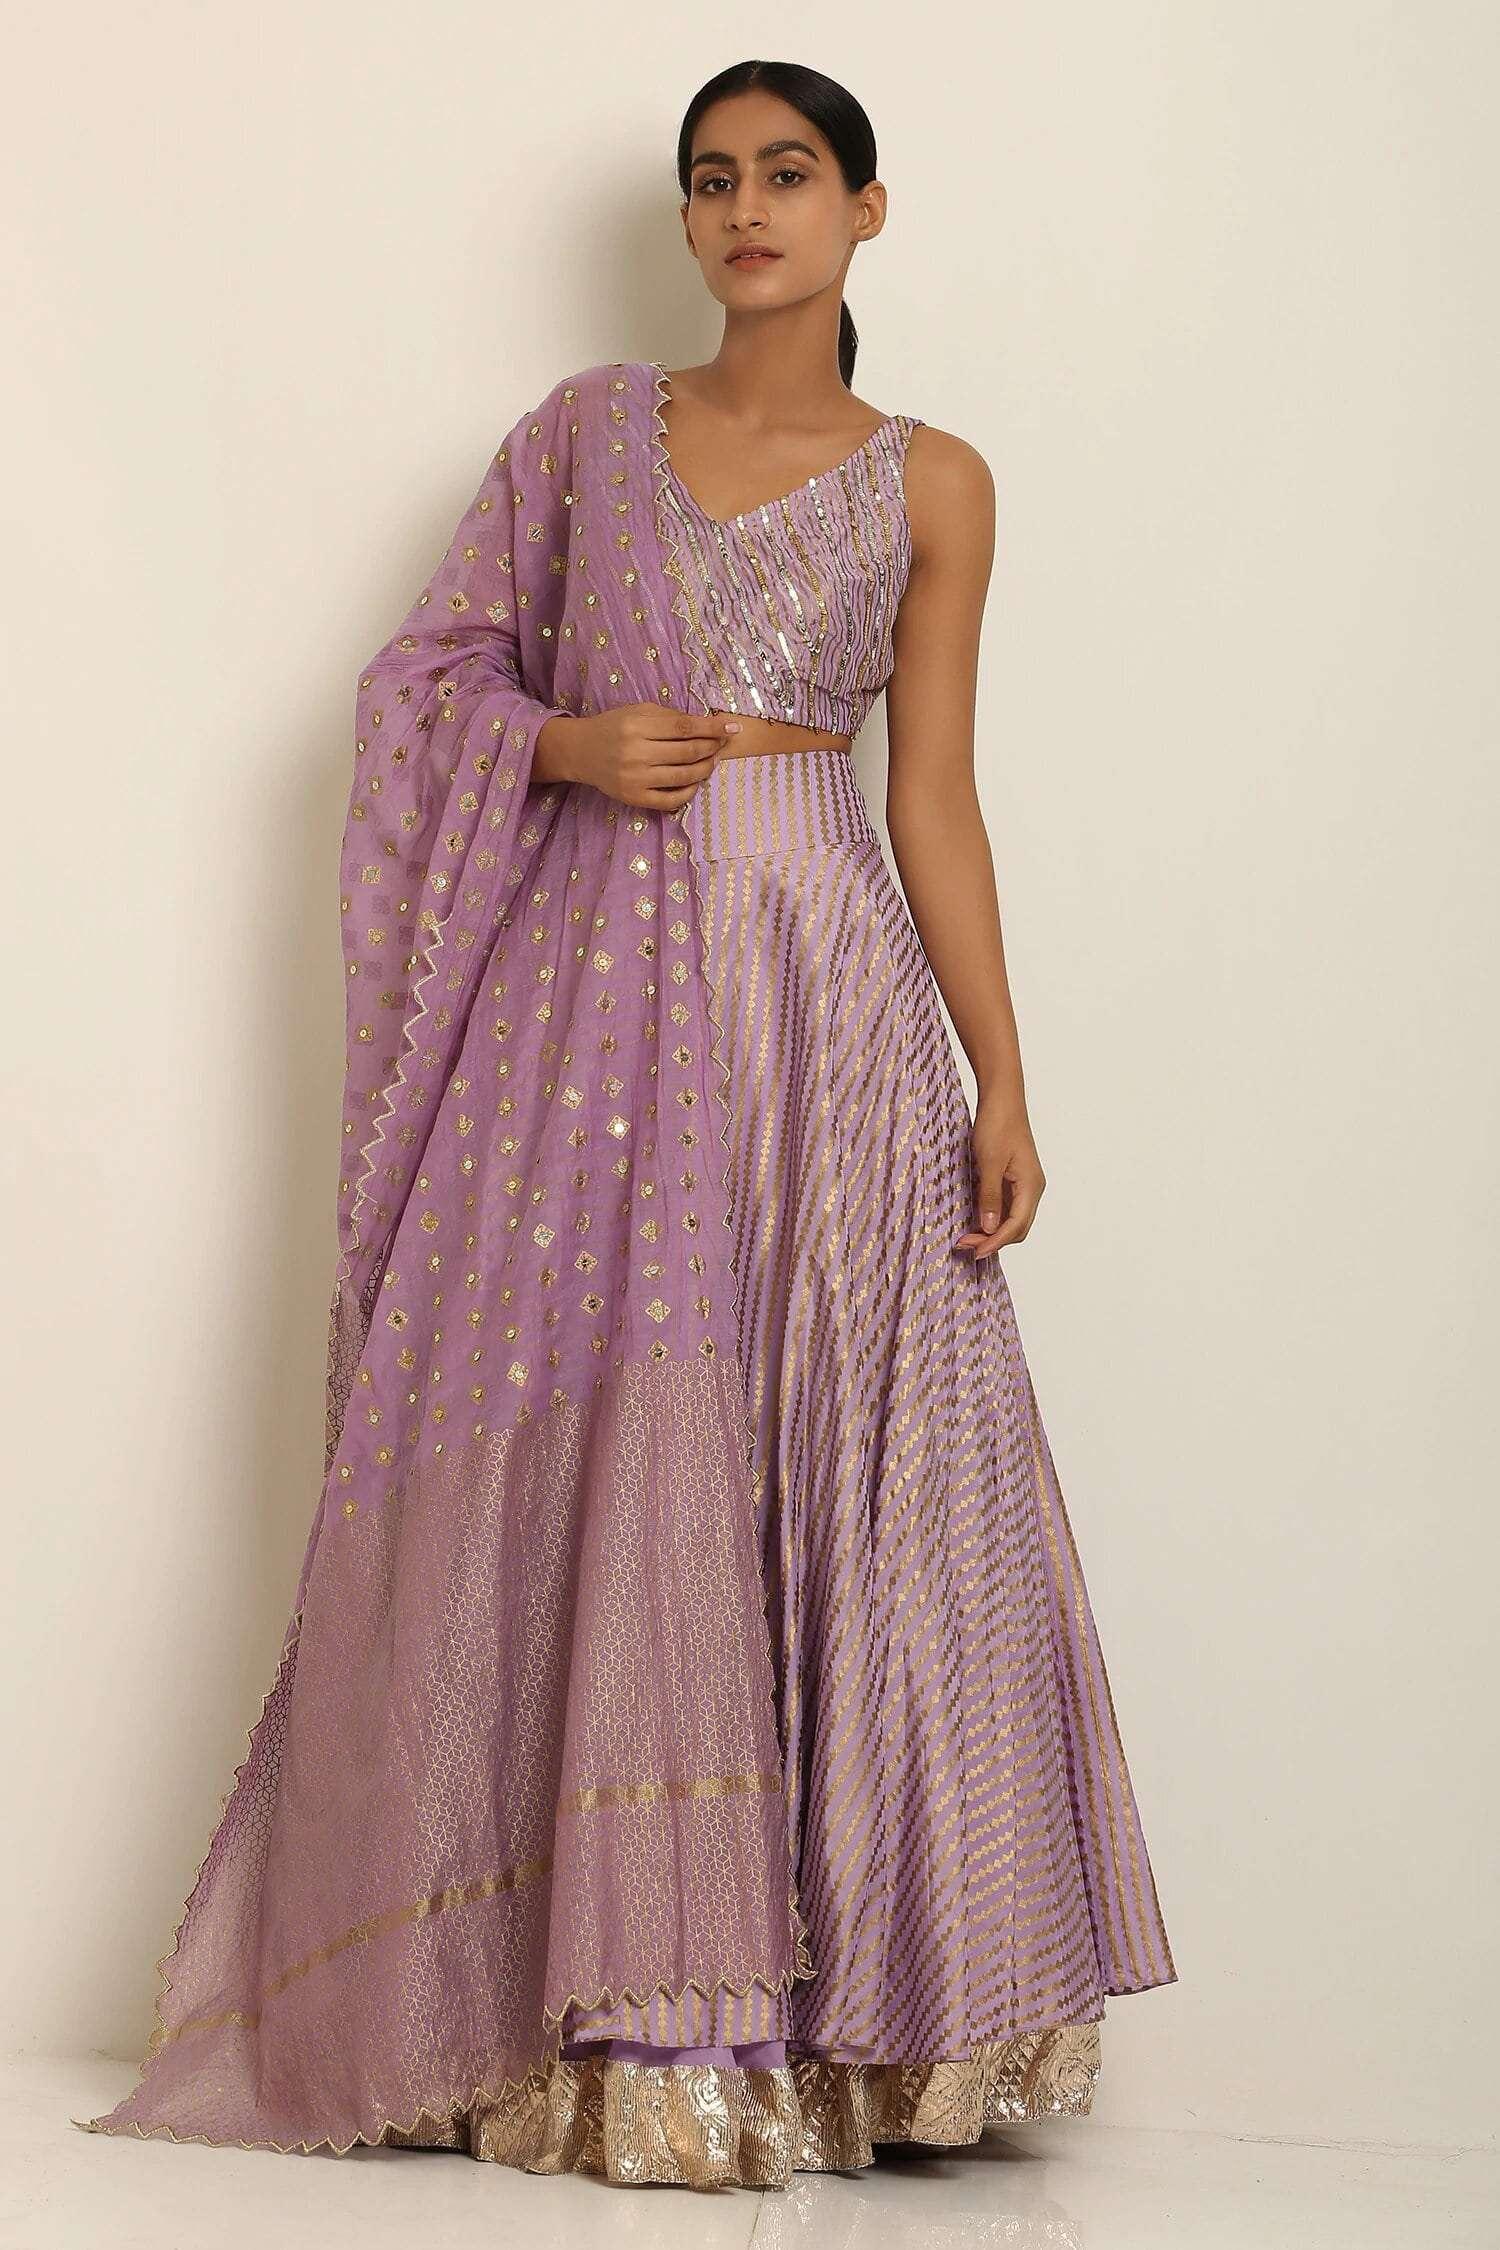 Seema Nanda lehenga for Diwali Shopping